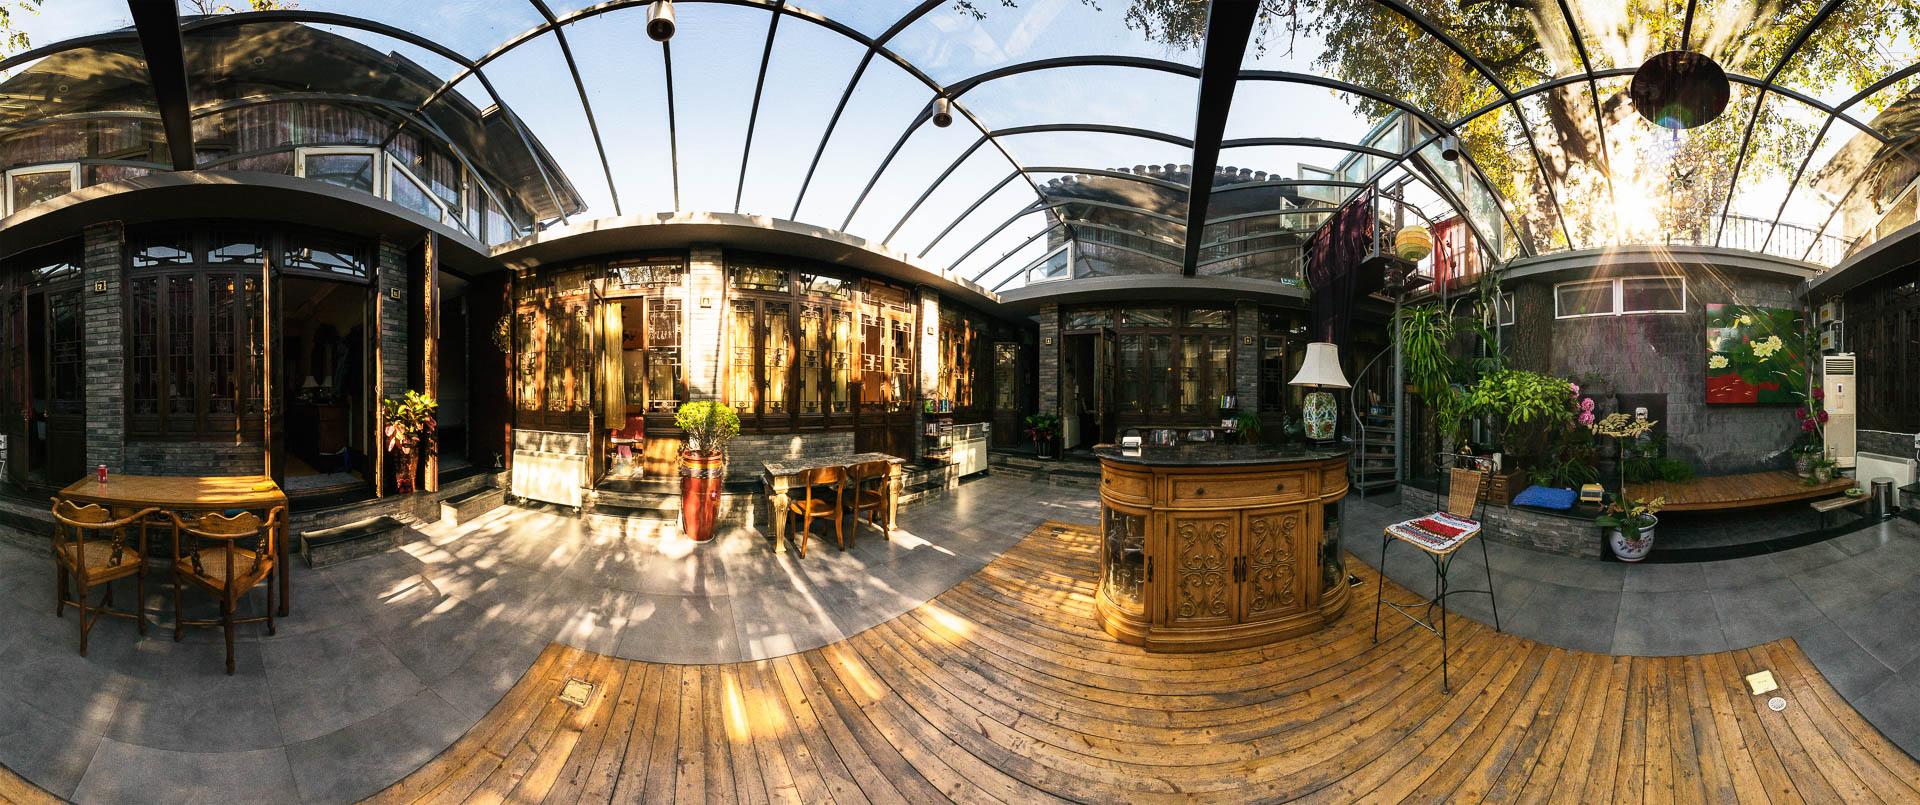 360 VR Beijing Hostel Fotograf Tobi Bohn Berlin